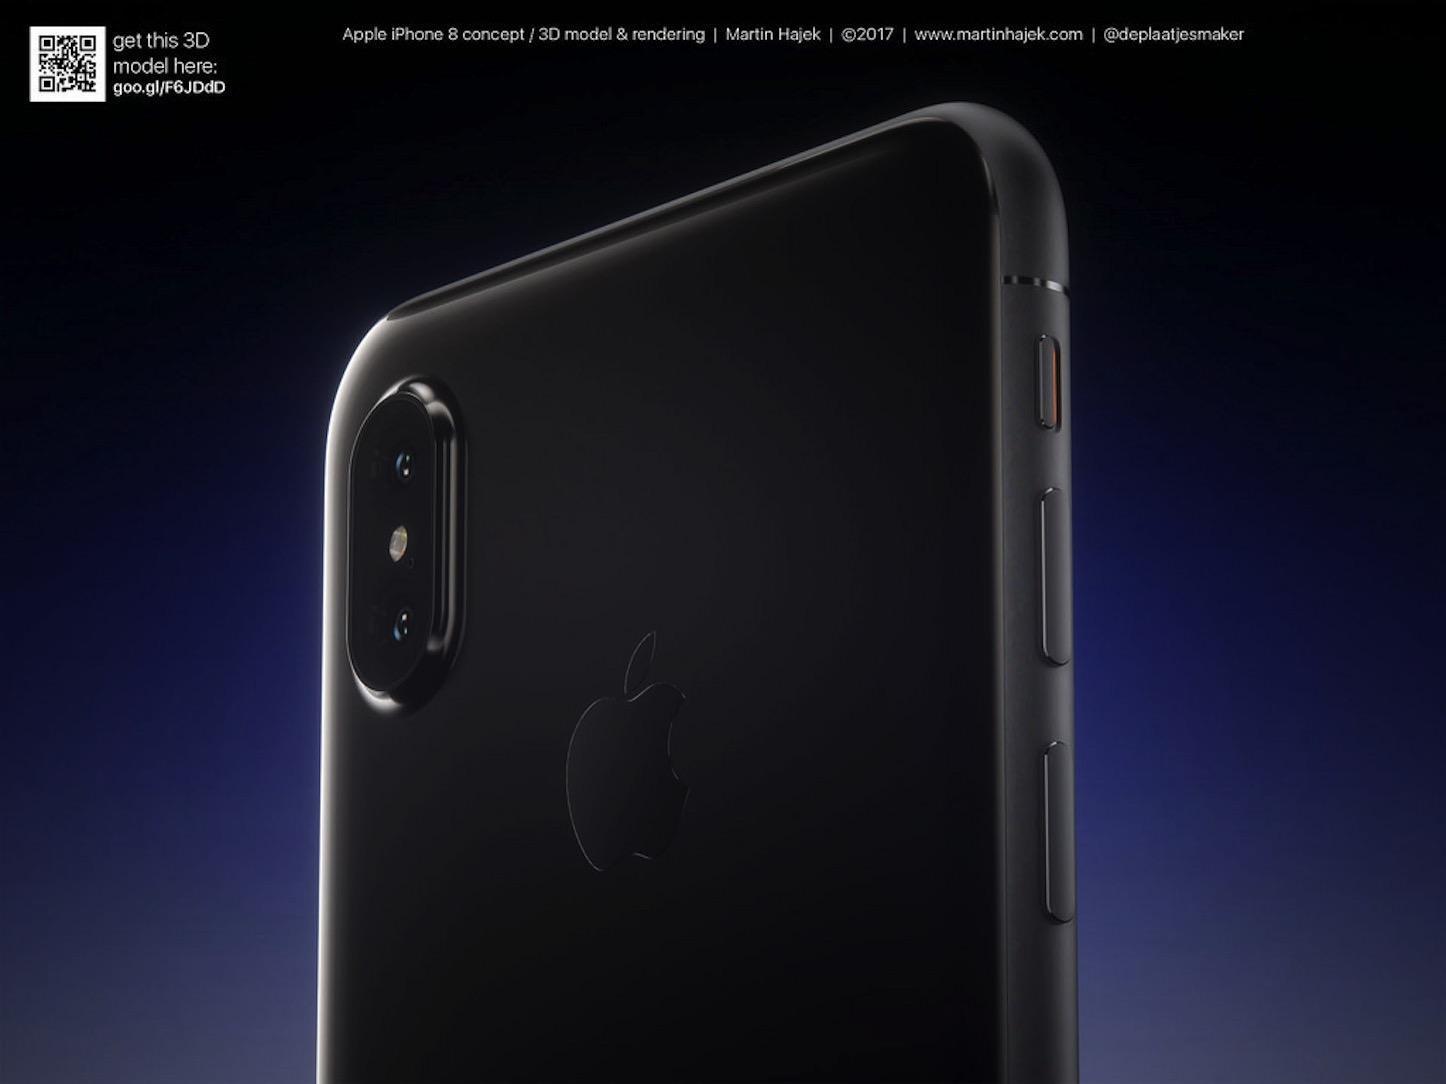 iPhone-Pro-8-Martin-Hajek-Reders-4.jpg